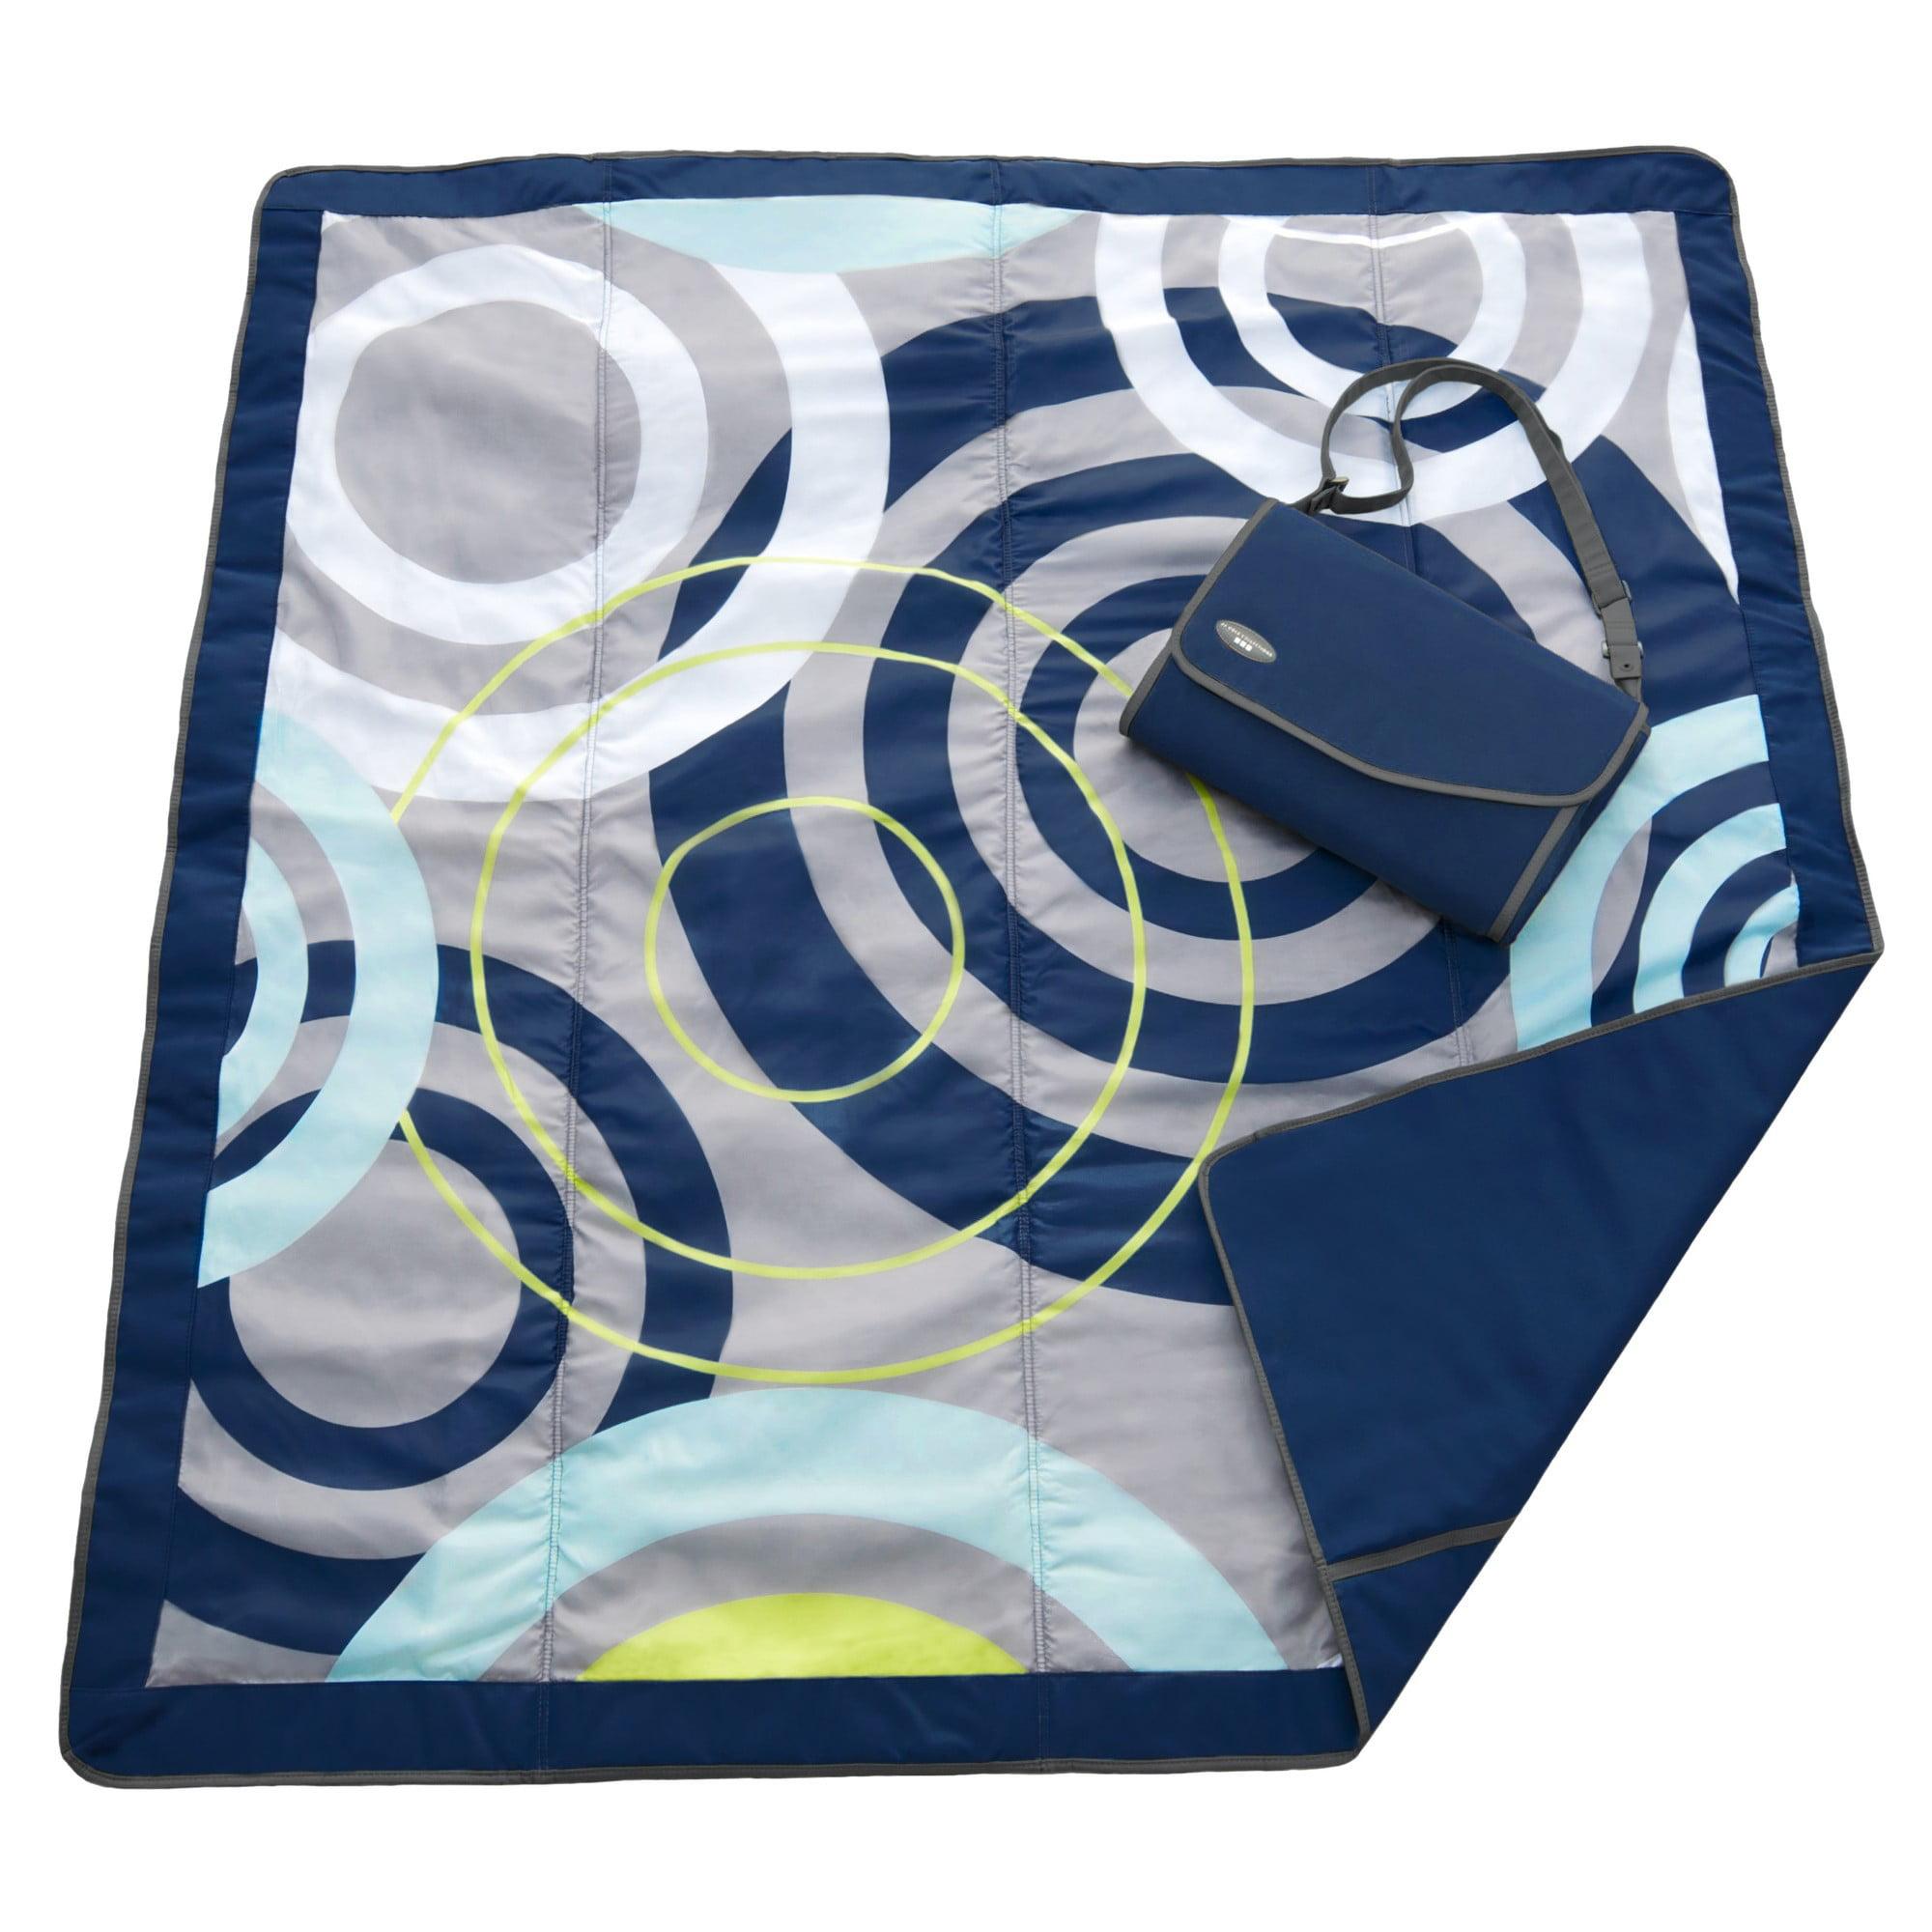 JJ COLE Outdoor Blanket - 7 X 5 - Blue Orbit